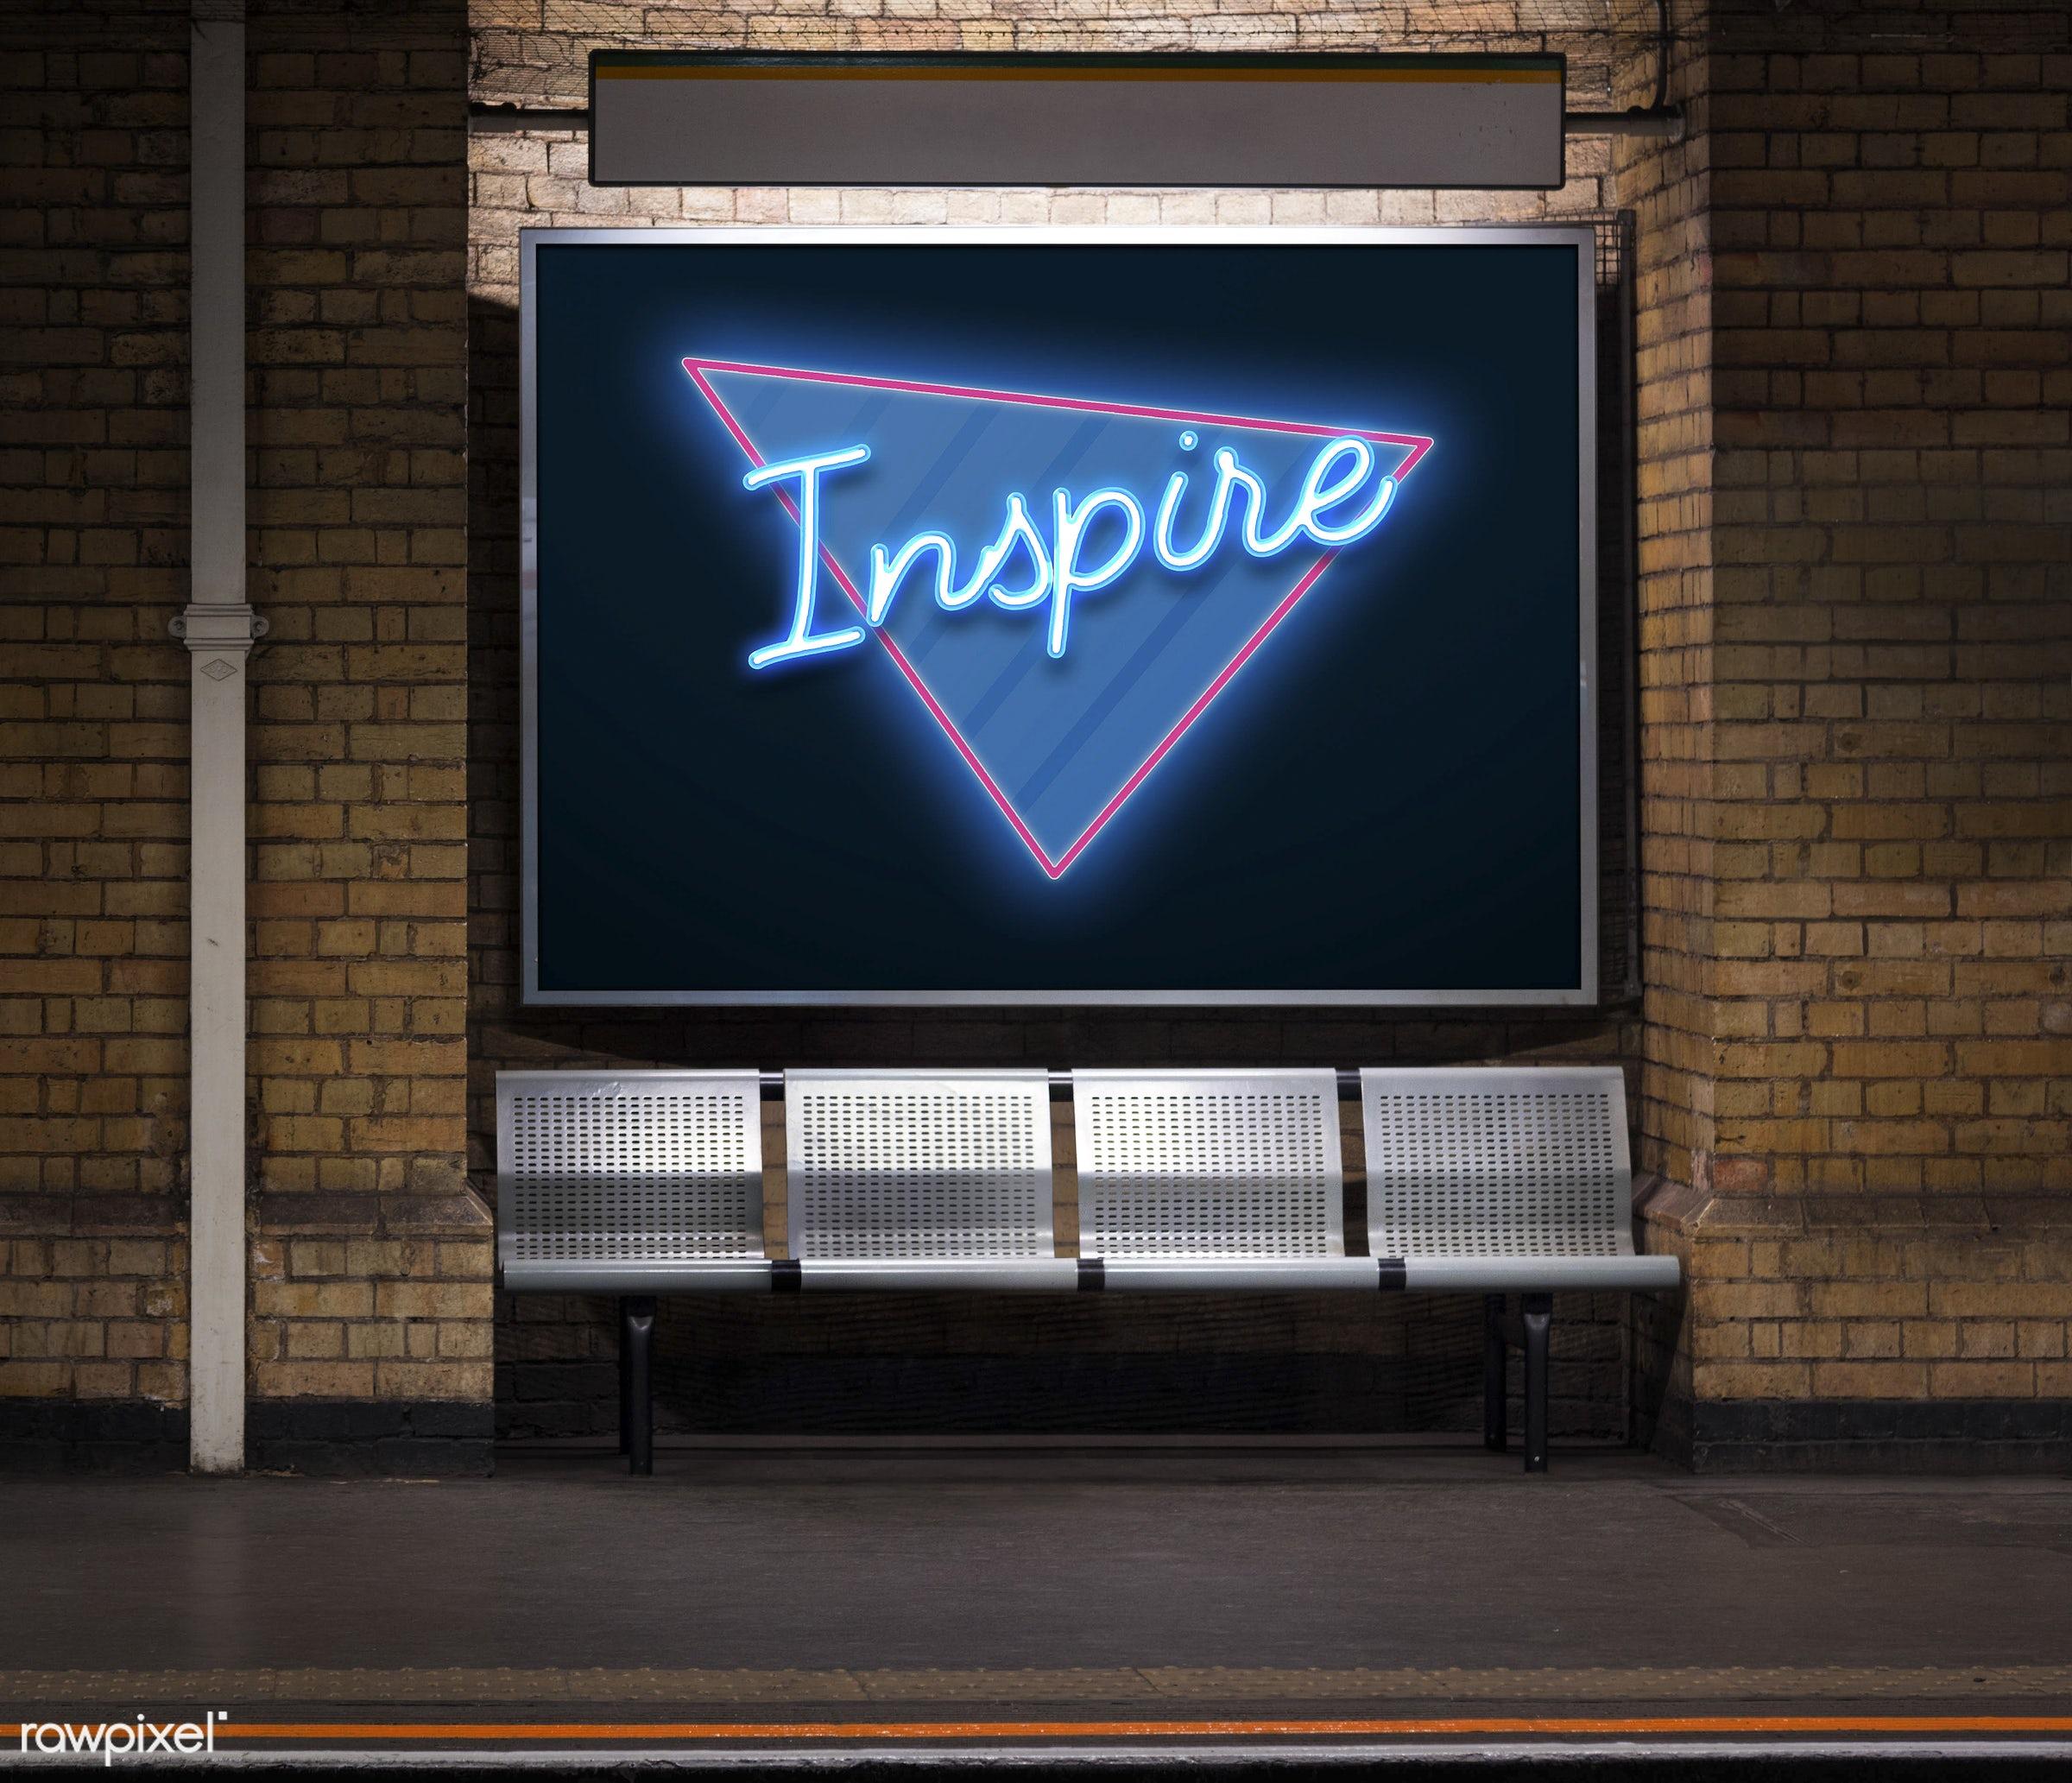 aspiration, be creative, believe, bricks, brickswall, creativity, dream big, dreams, encourage, expectations, goal, graphic...